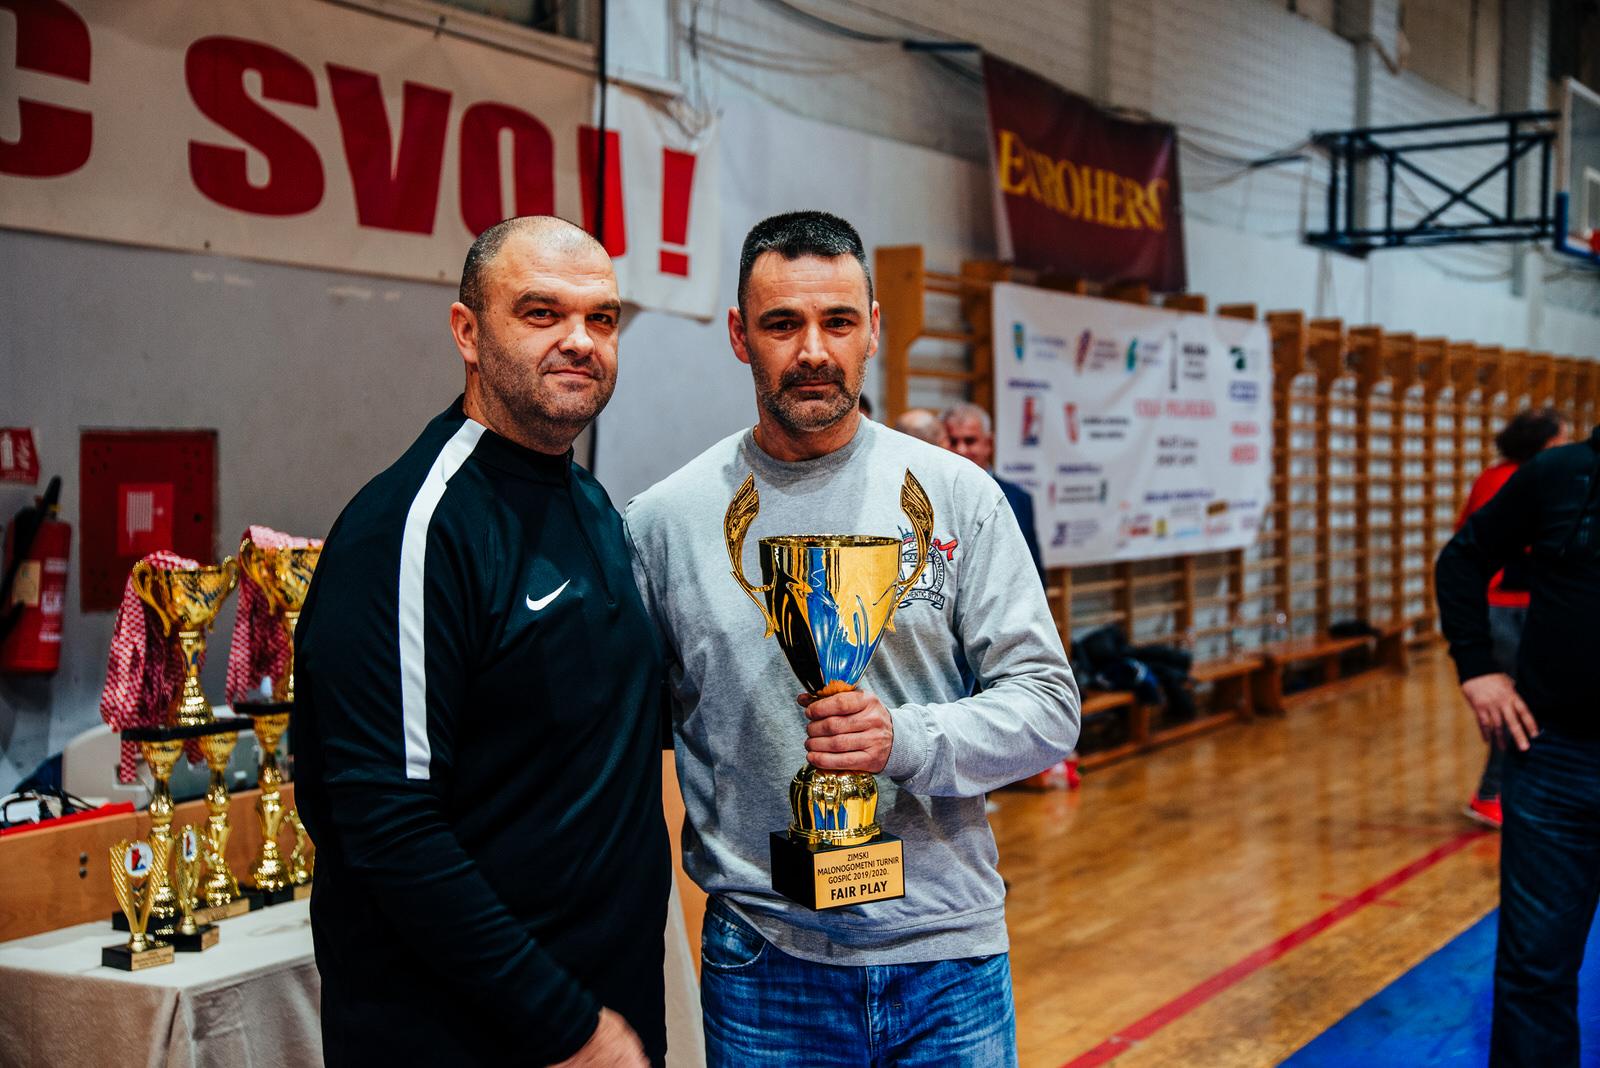 likaclub_zimska-malonogometna-liga-gospić_2019-20-127